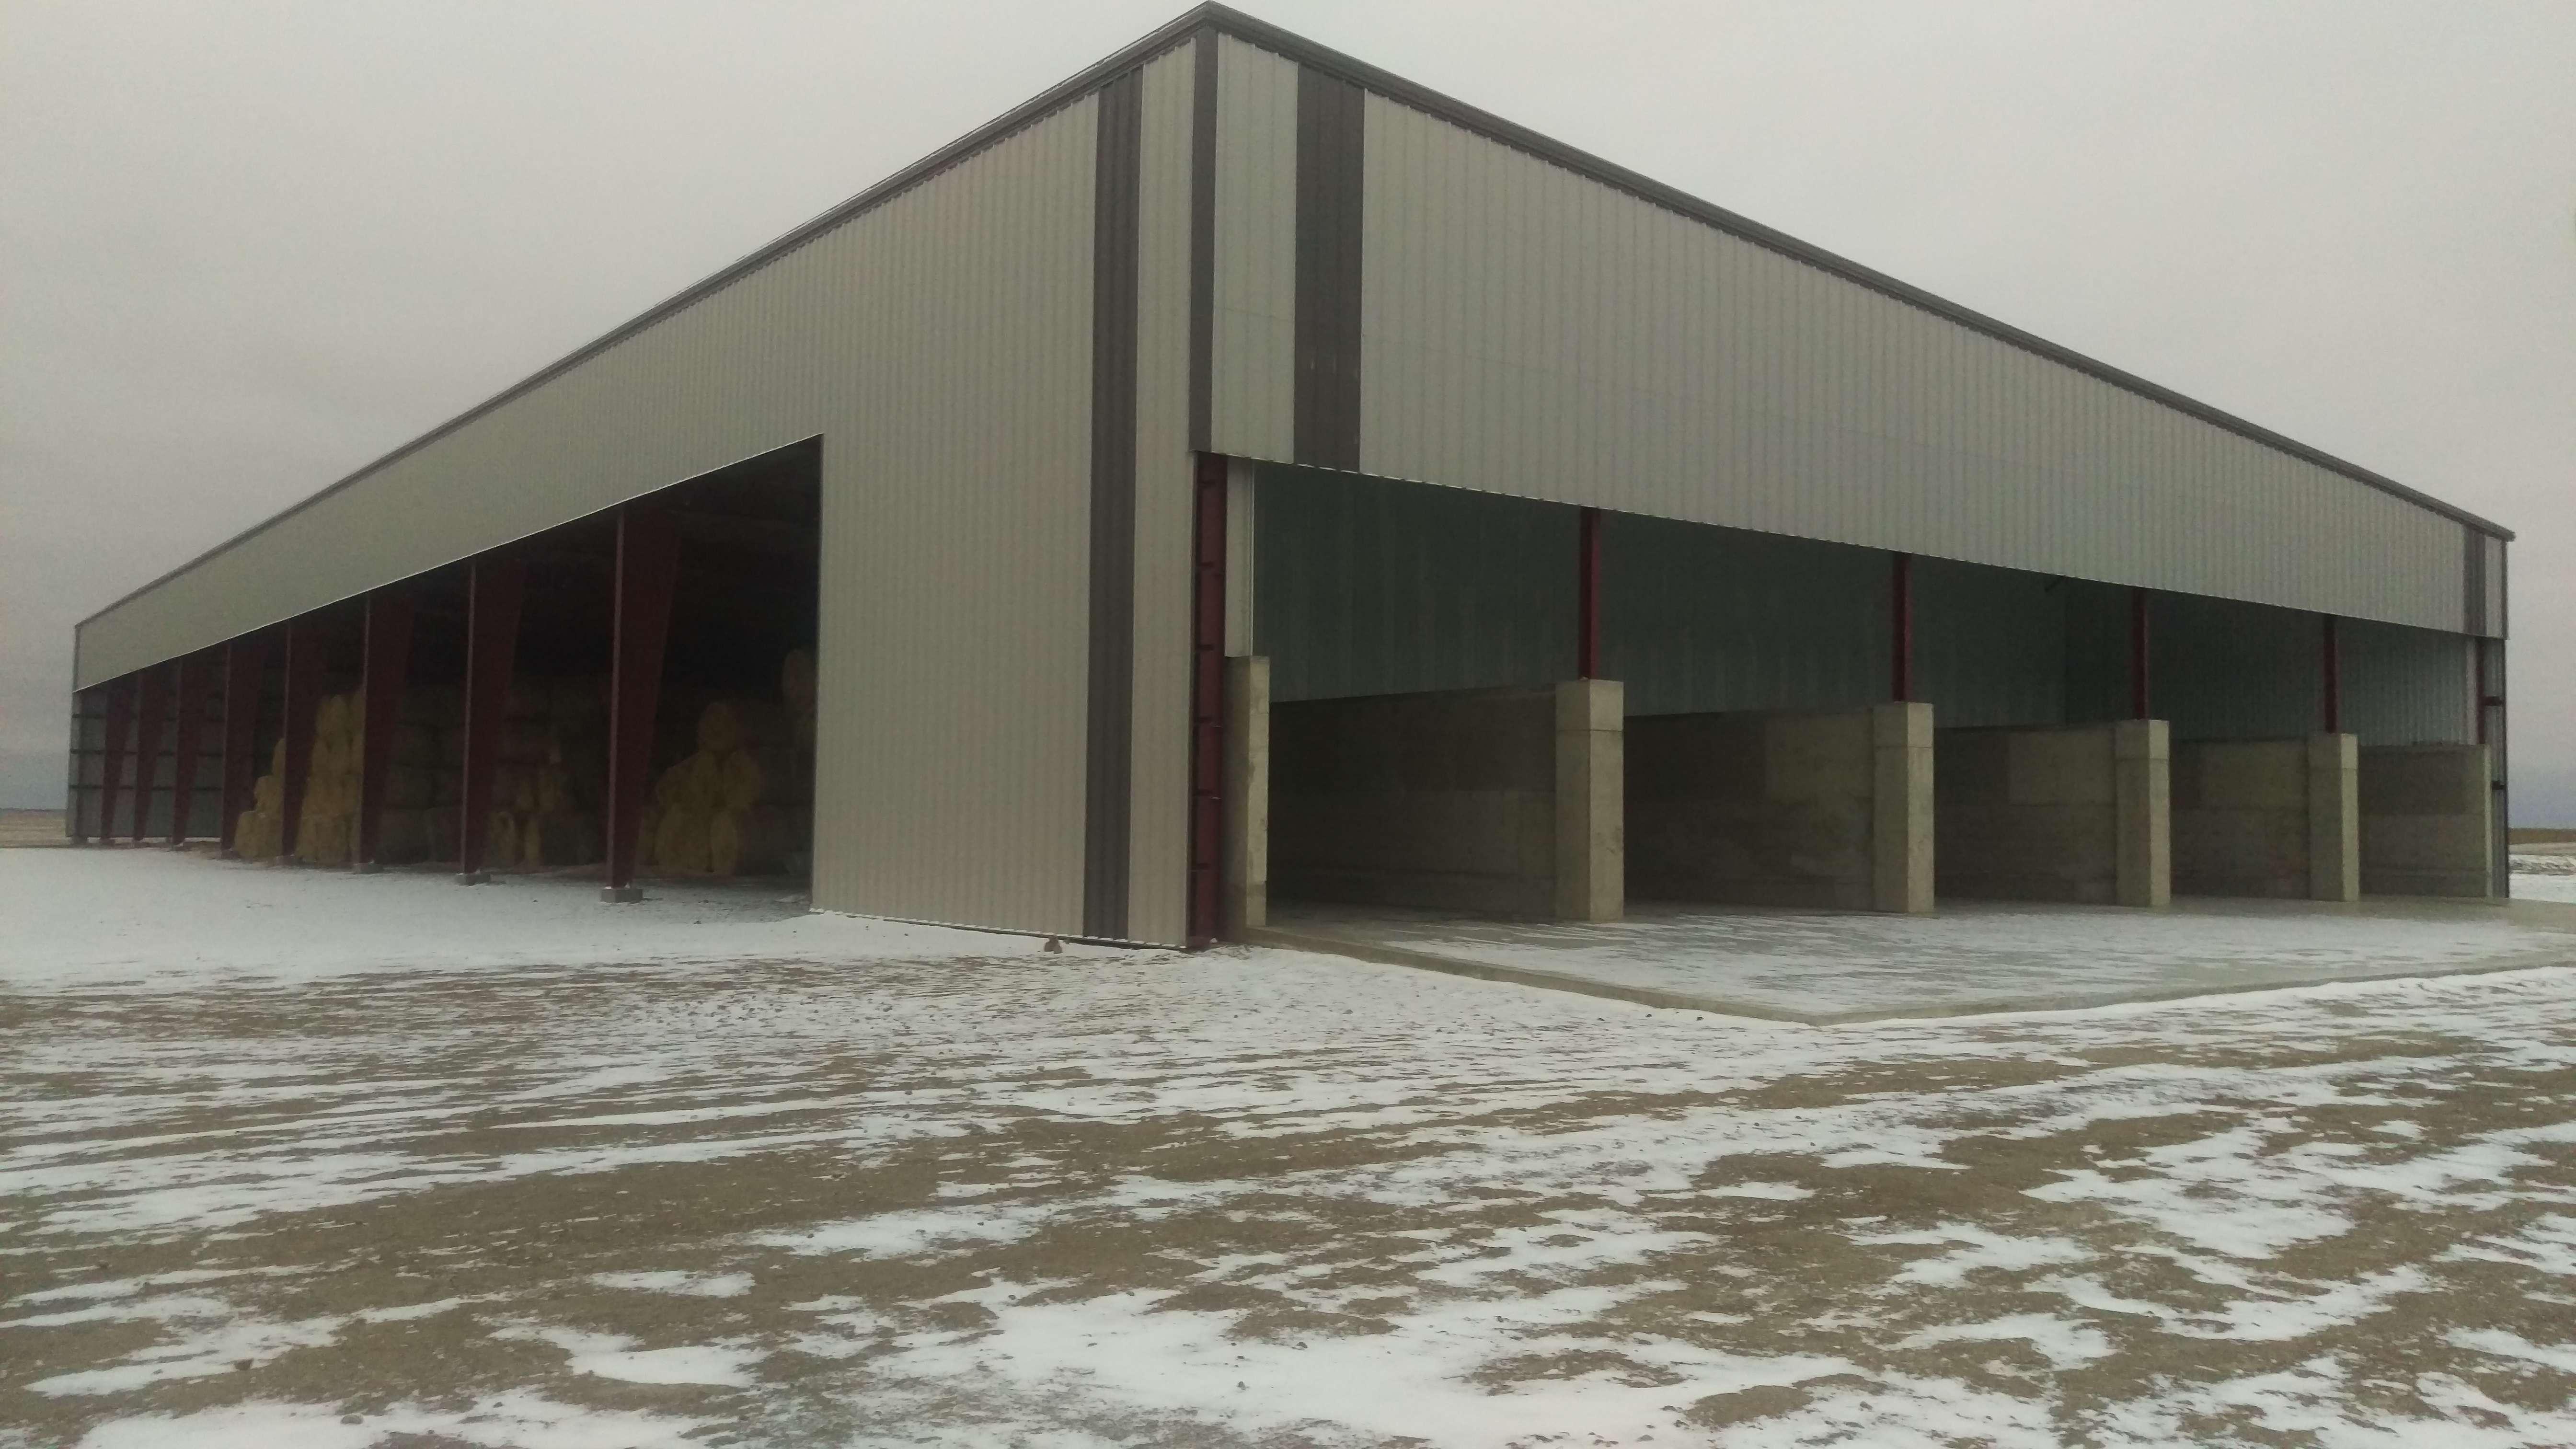 Kenaston, Saskatchewan - Clear Spring Farms